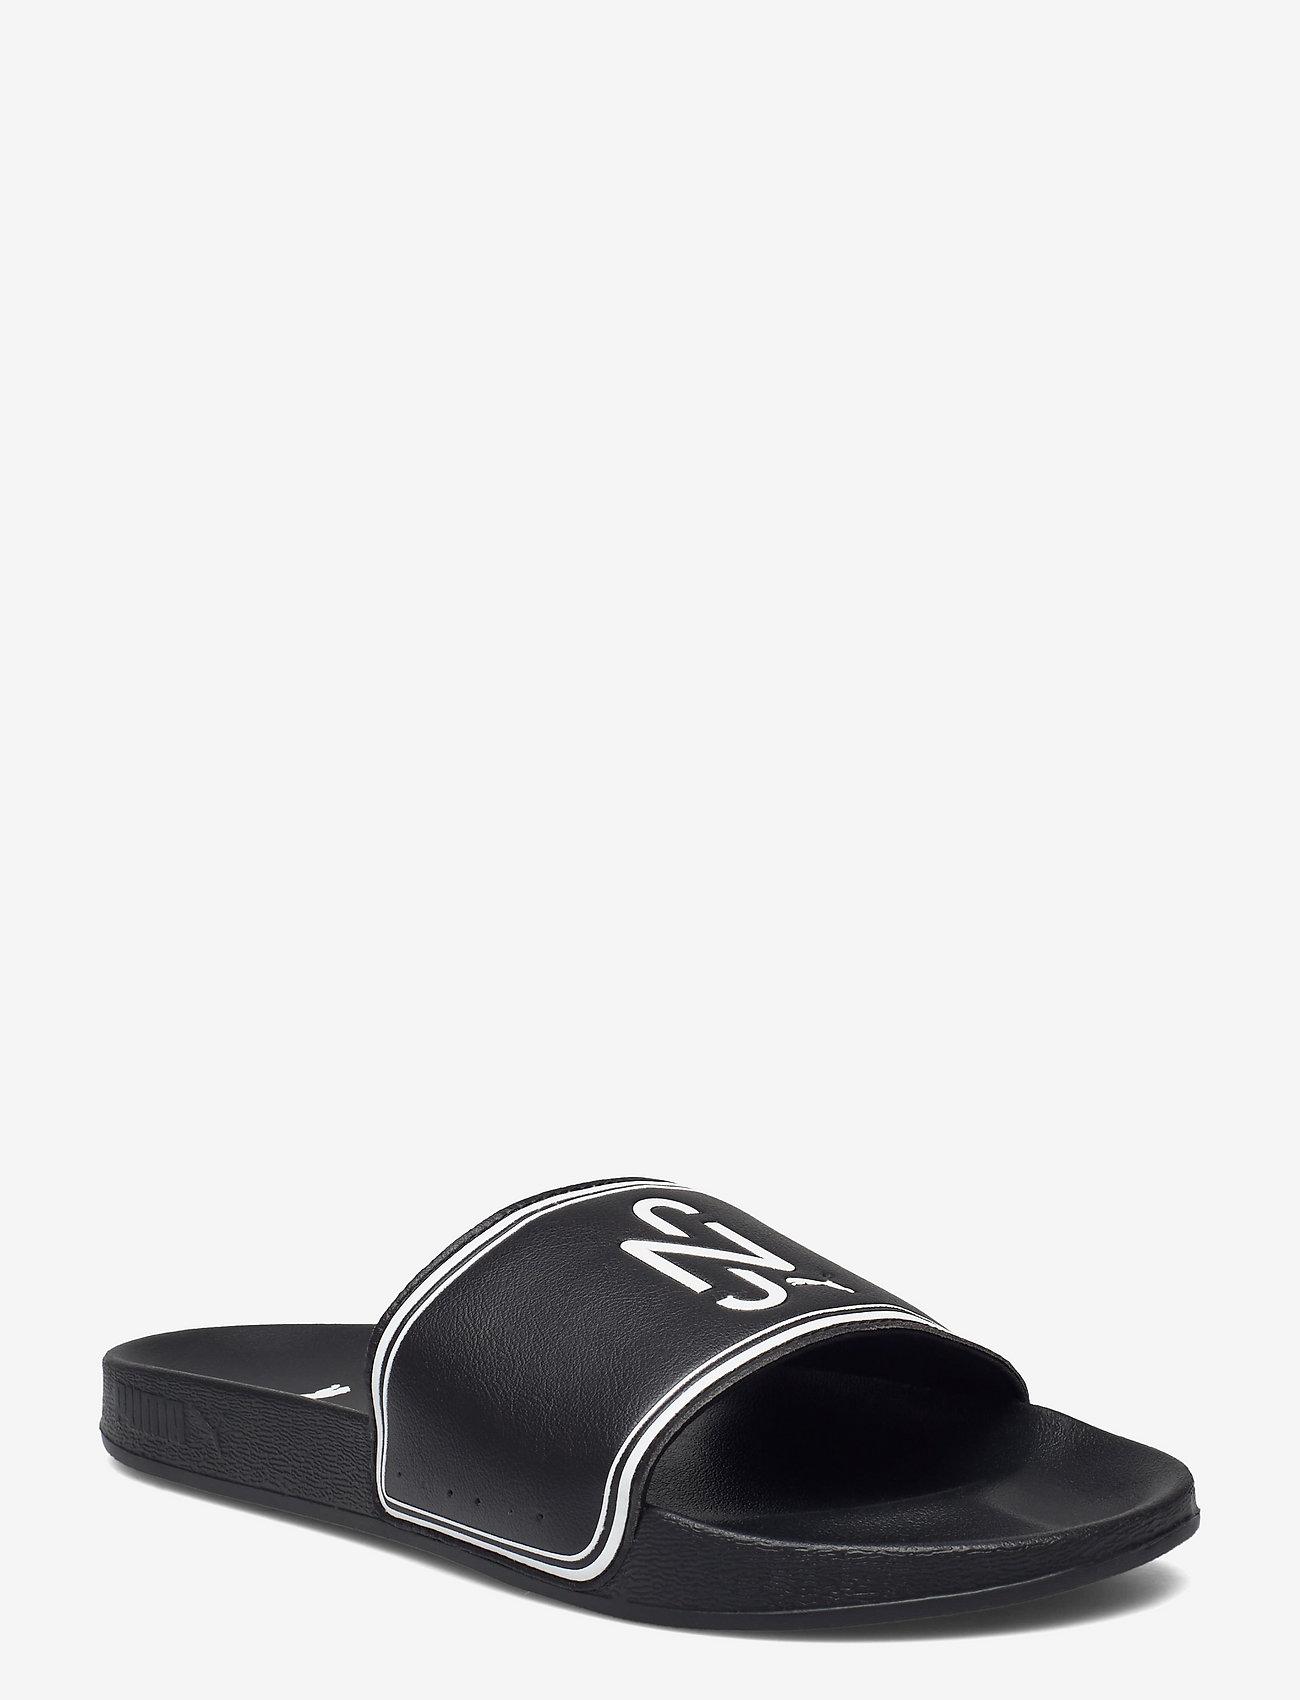 PUMA - Leadcat FTR NJR - shoes - puma black-puma white - 0